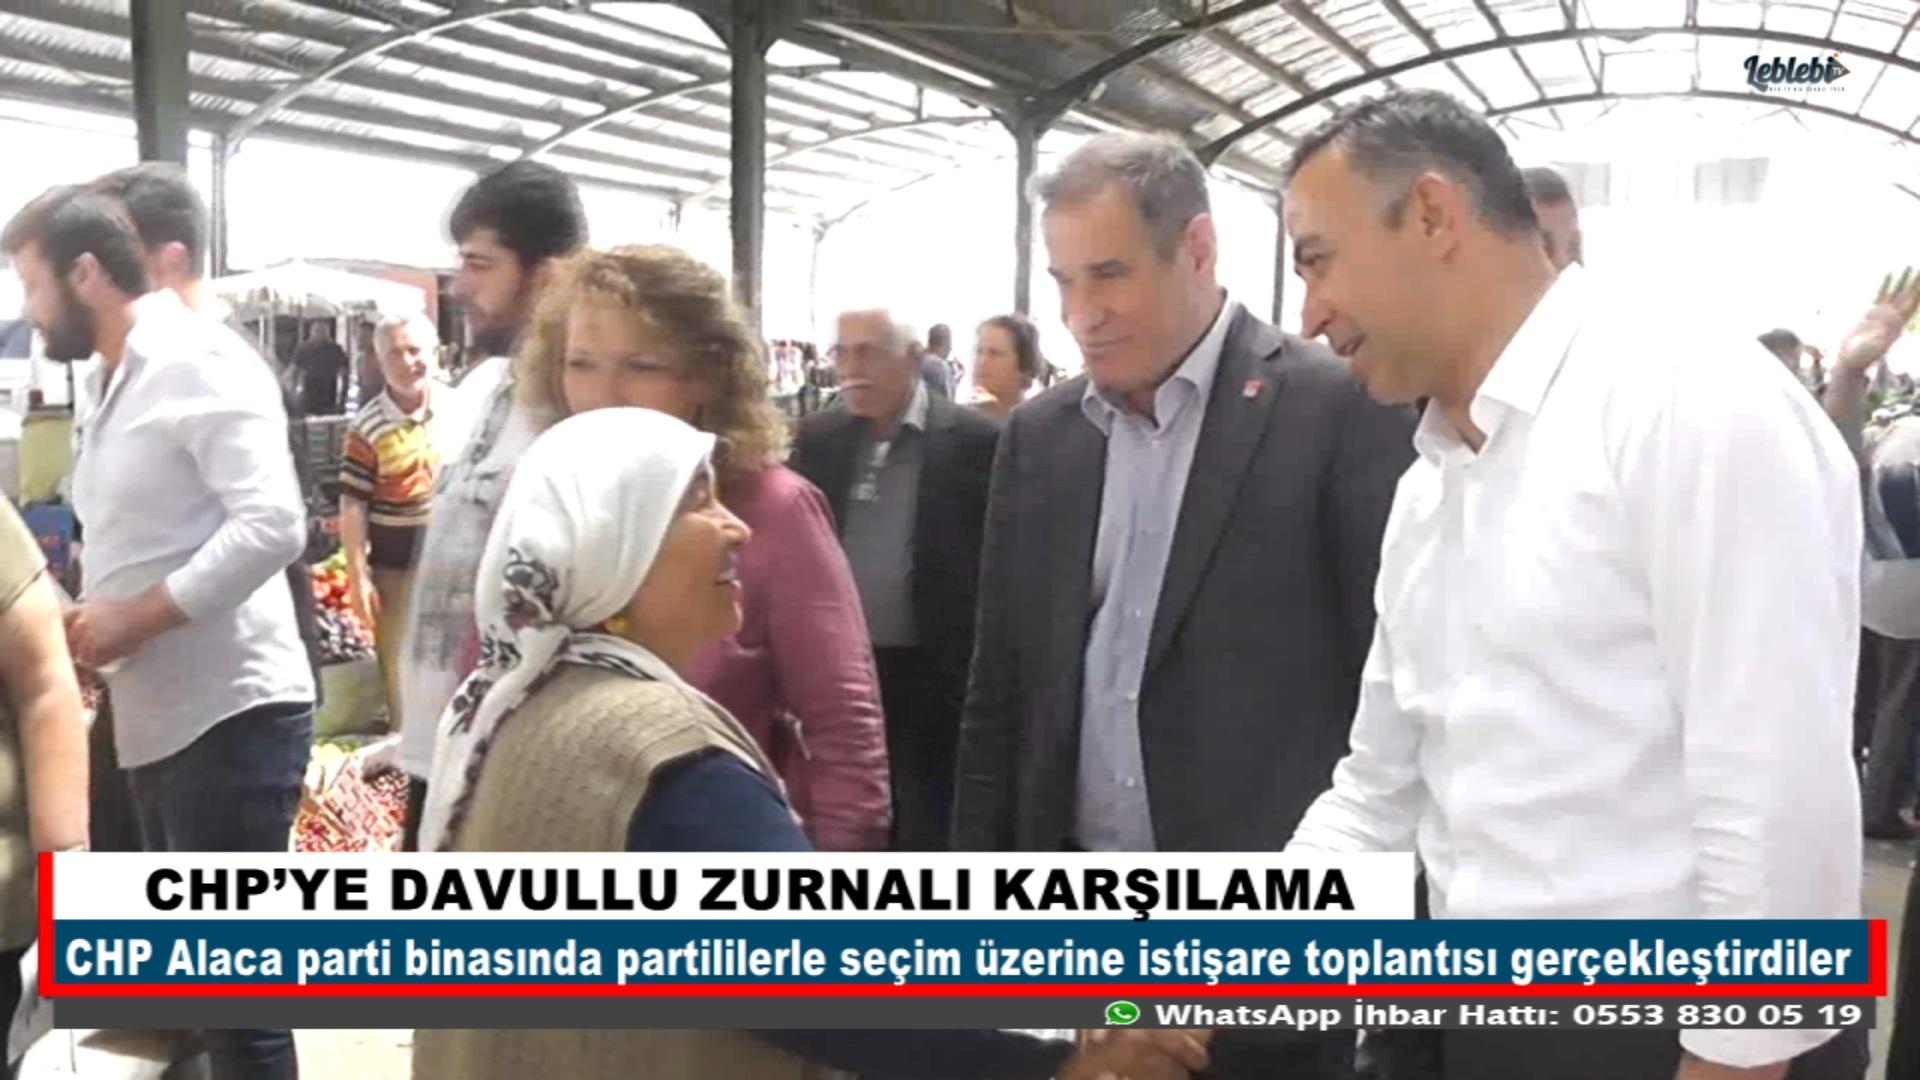 CHP'YE DAVULLU ZURNALI KARŞILAMA